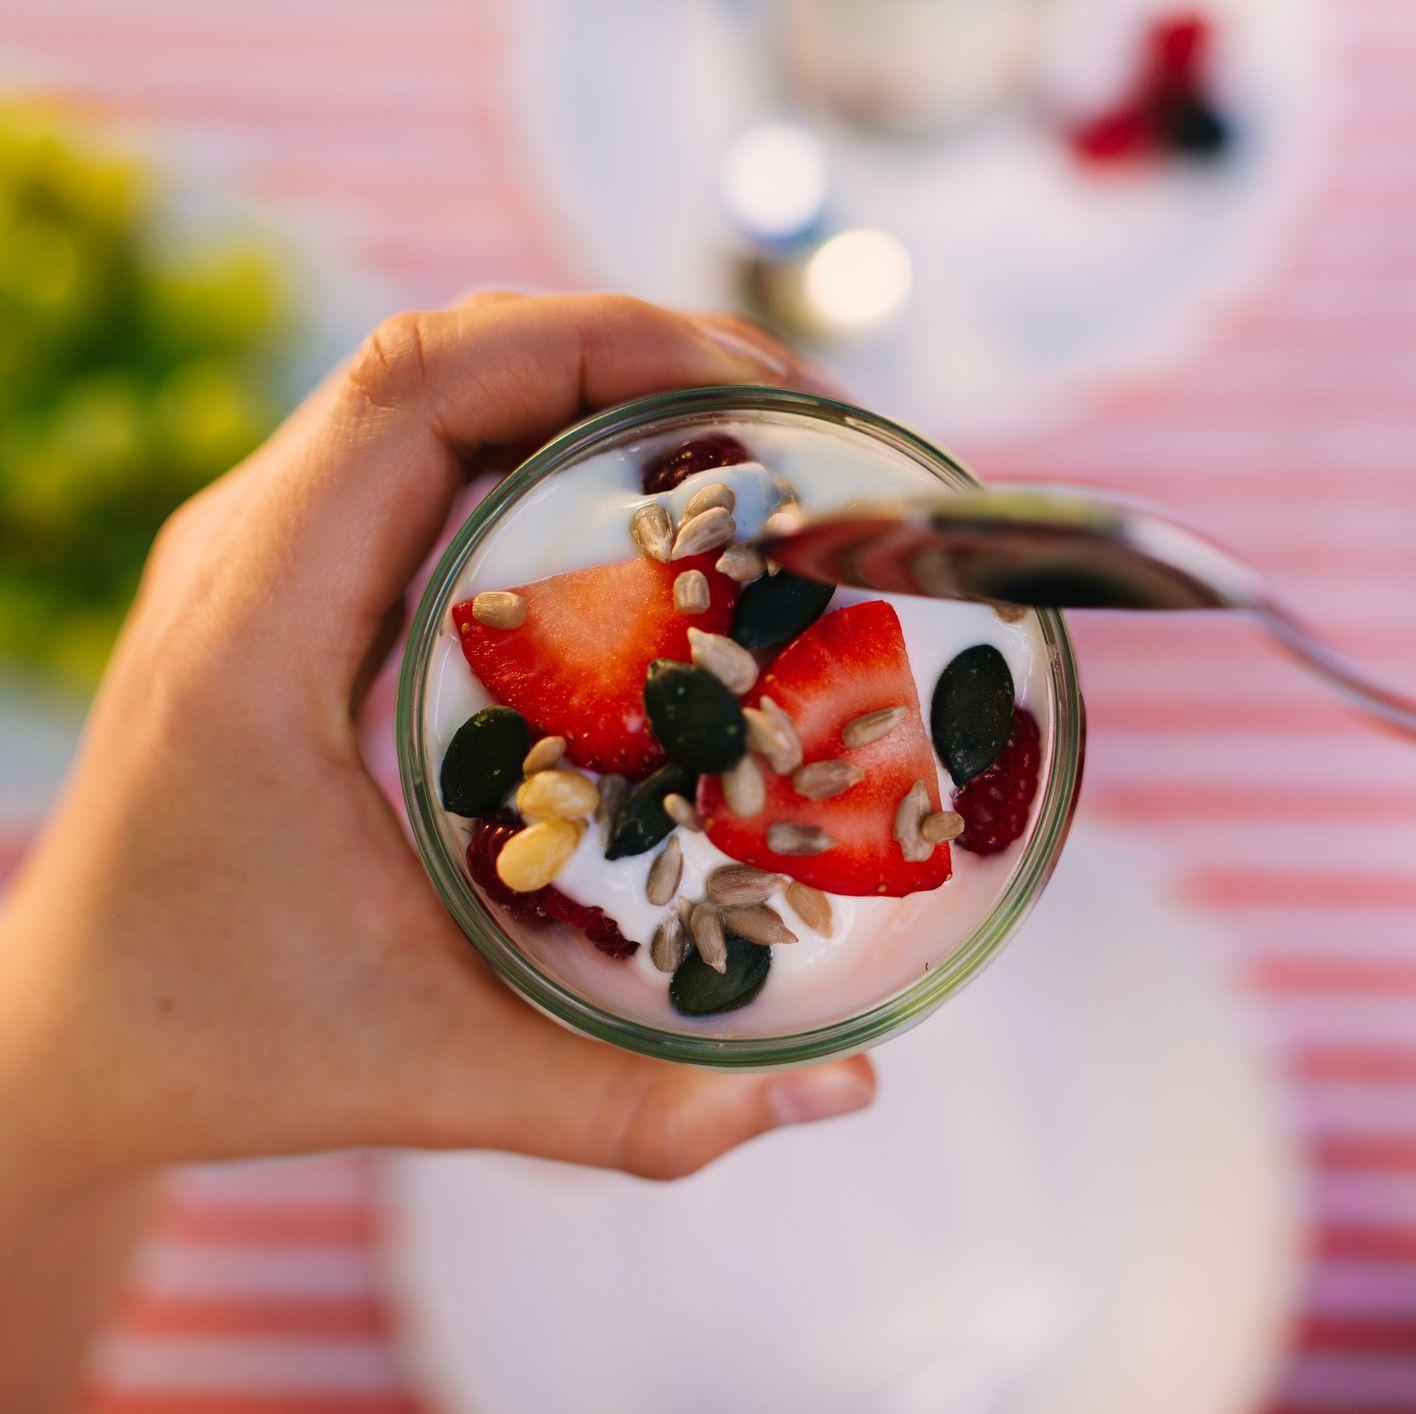 scooping yogurt and berries out of mason jar